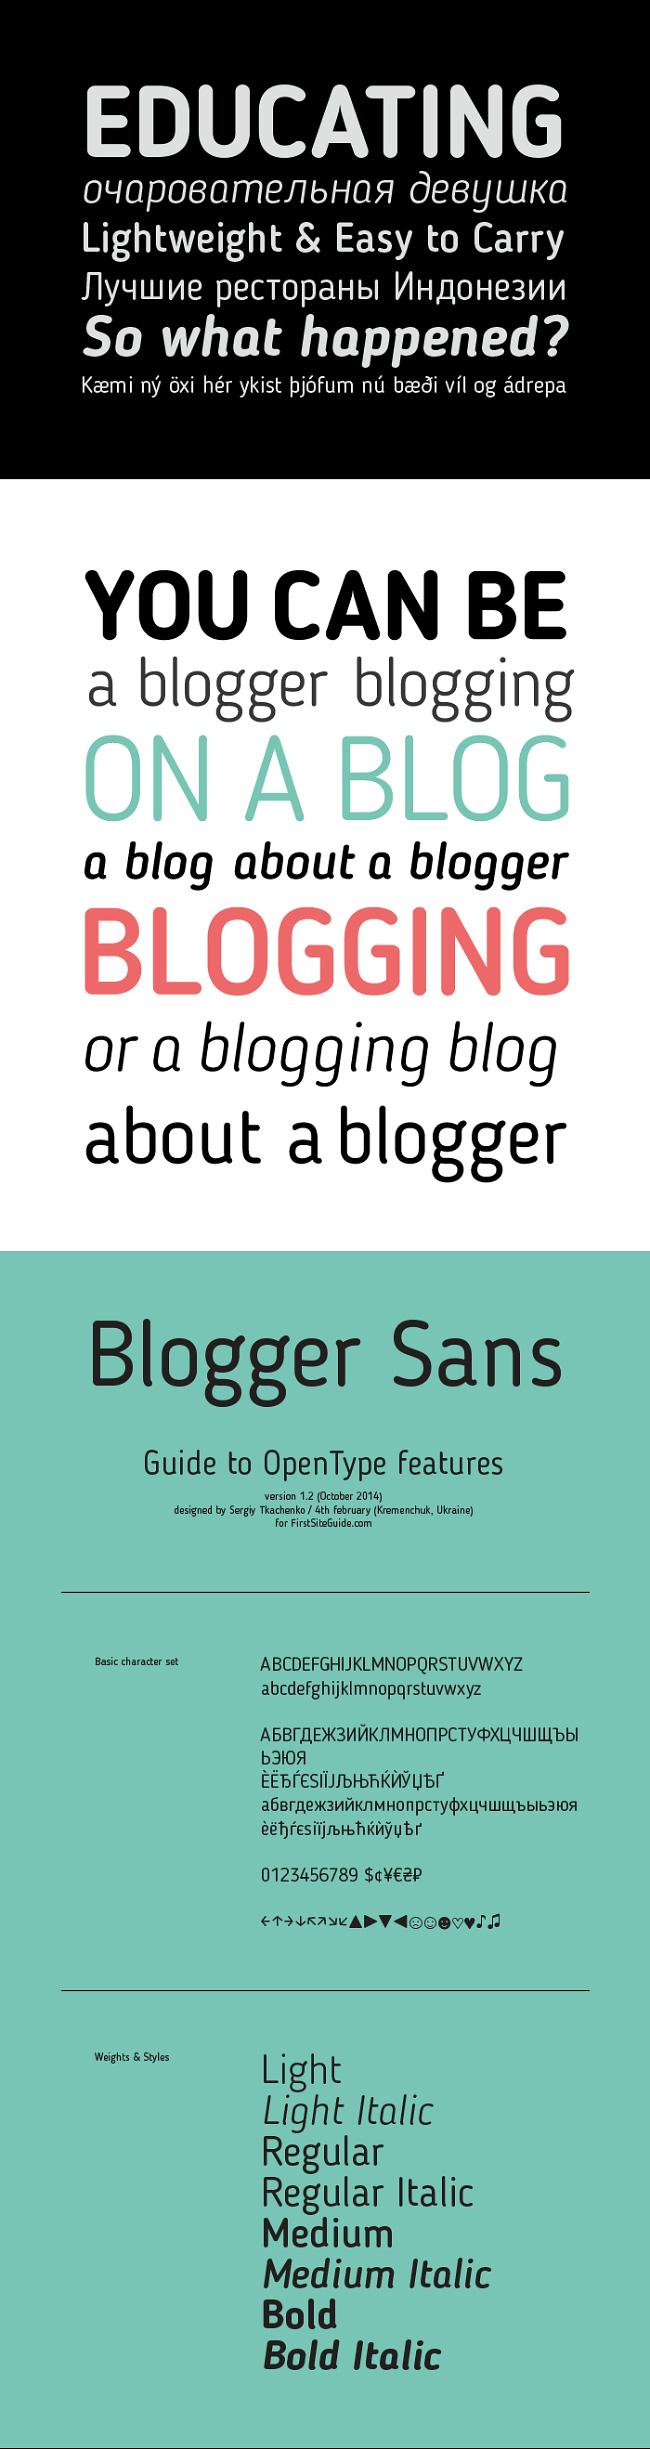 шрифт Blogger Sans фотошоп мастер